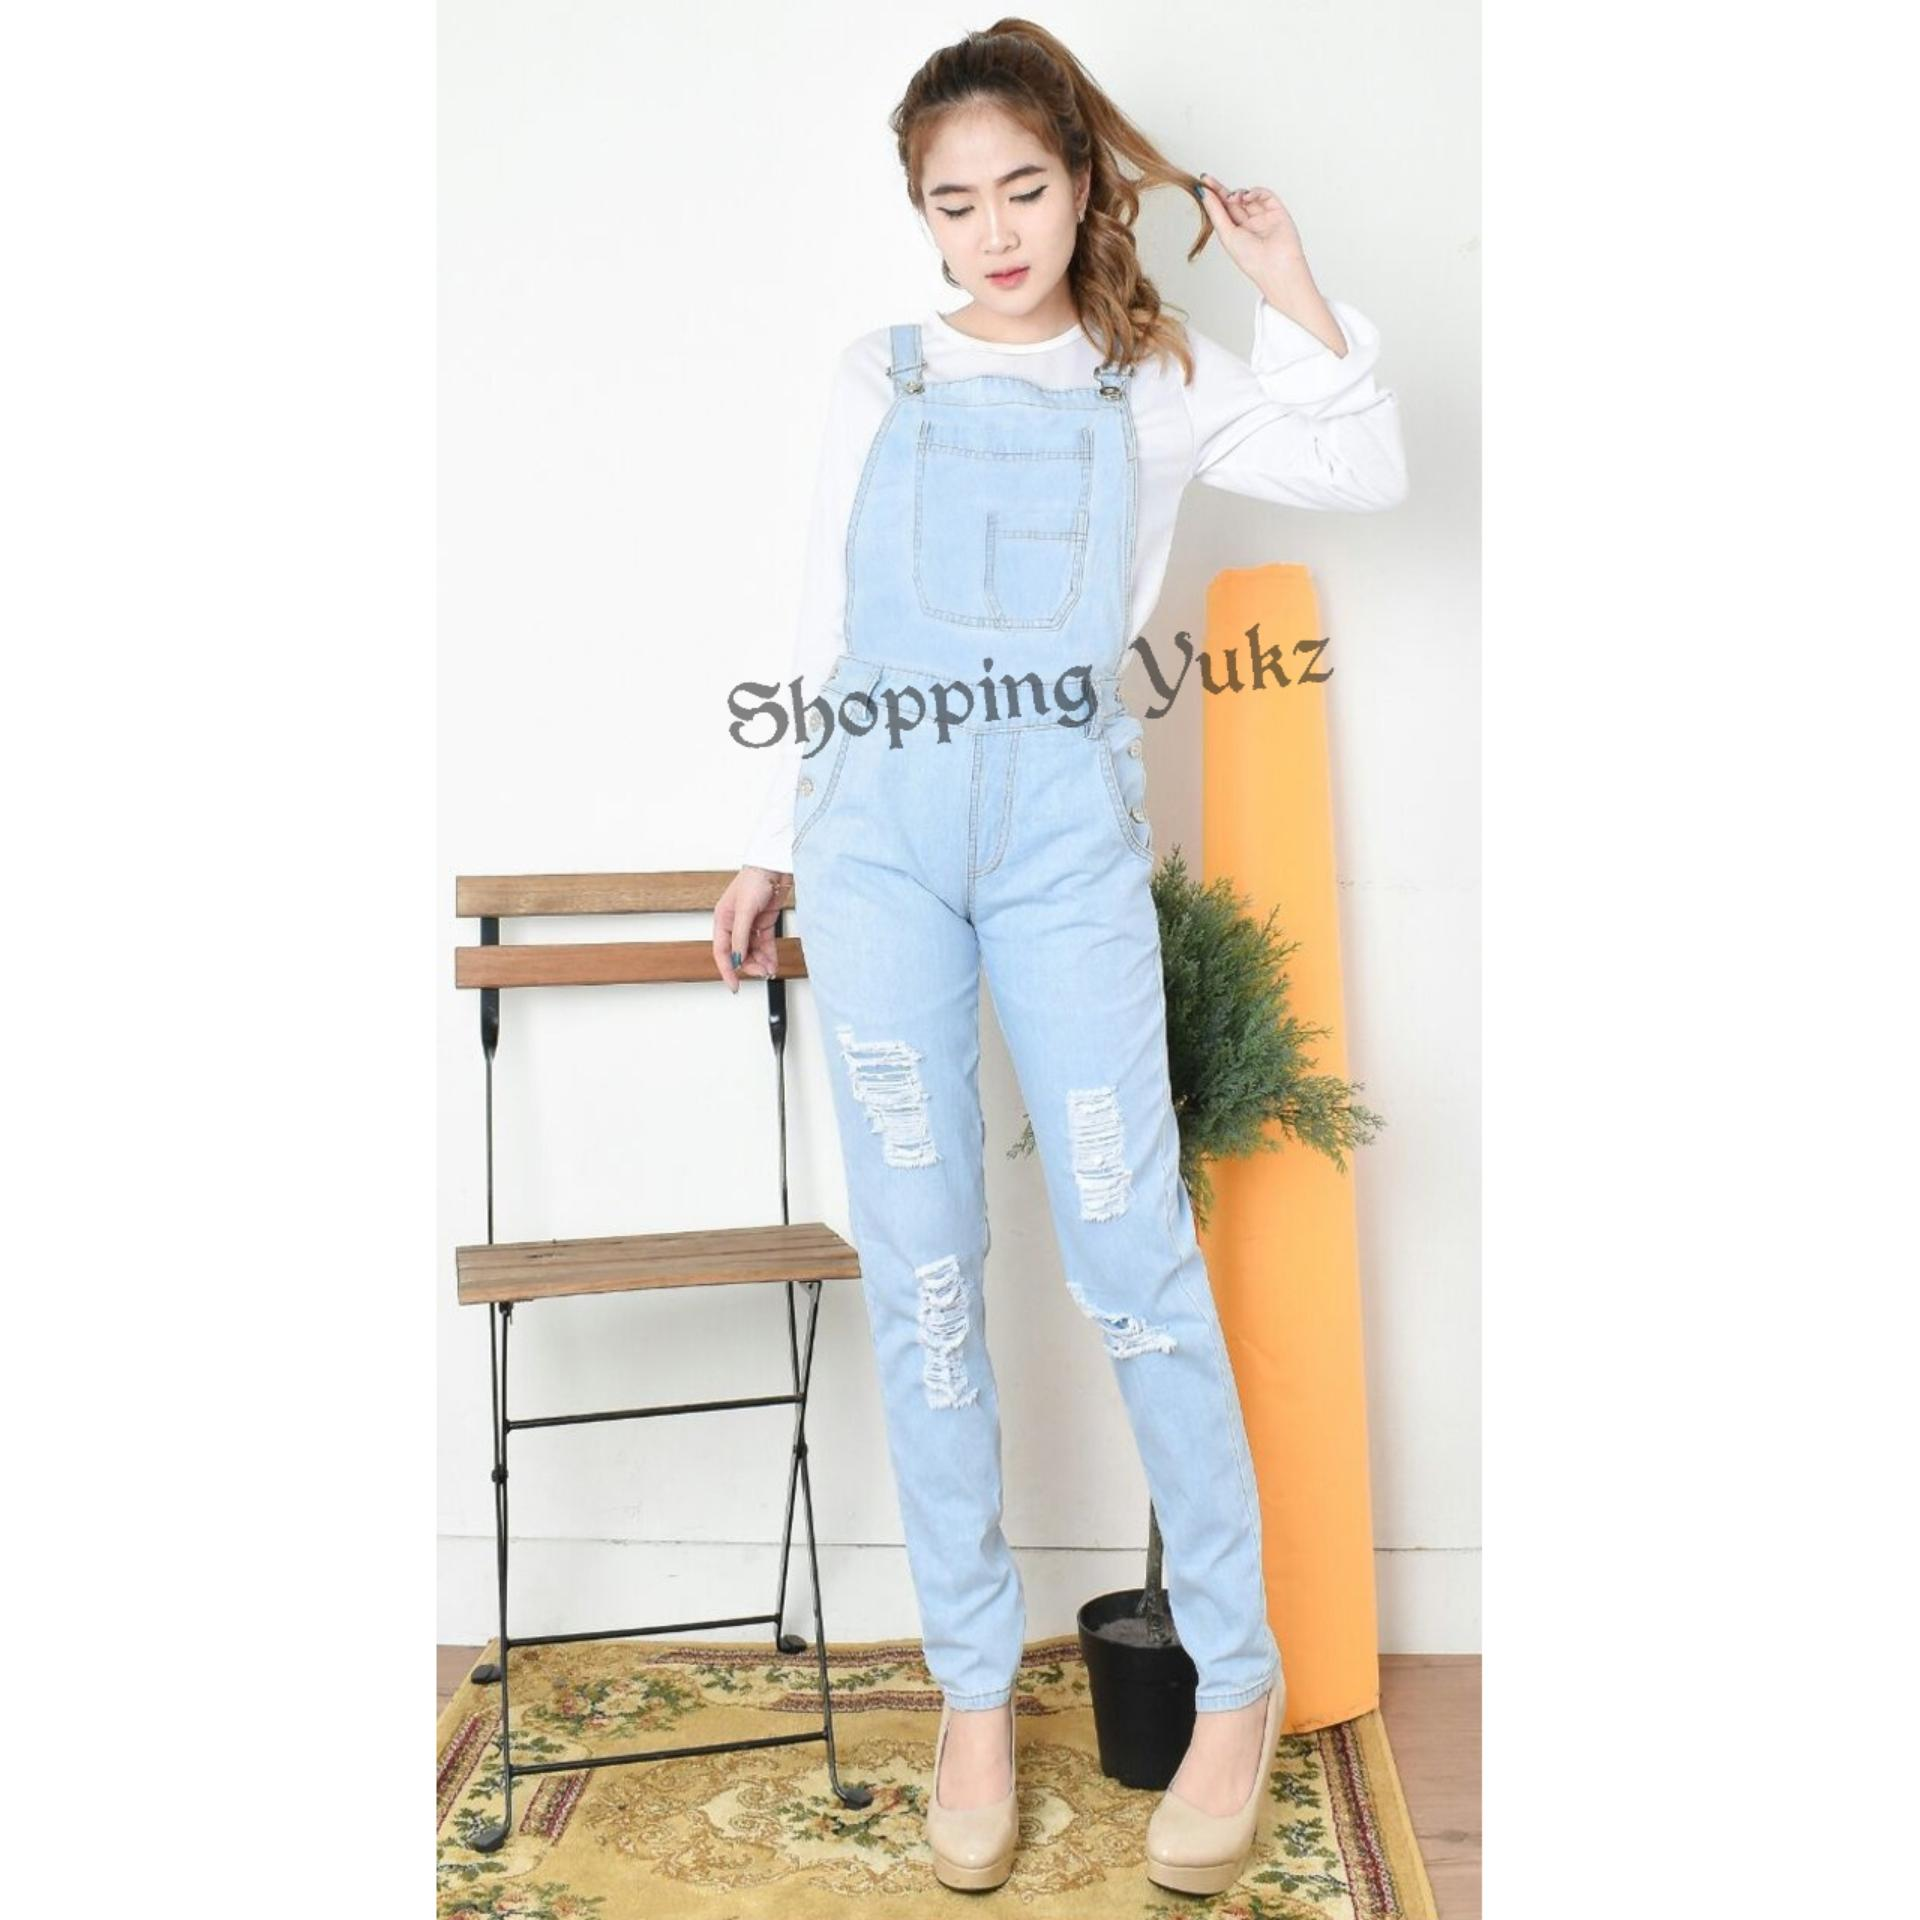 Shopping Yukz Overall Jumpsuit Jeans Denim  Wanita JEAN ( Tanpa Inner ) /Baju Kodok Jeans /Jumpsuit Jeans/ Ripped Jeans/Jumpsuit Denim Wanita/Jumpsuit Remaja/Jumpsuit Murah/Jumpsuit Terusan/Jumpsuit Panjang/Jumsuit Wanita/Jumsuit Denim